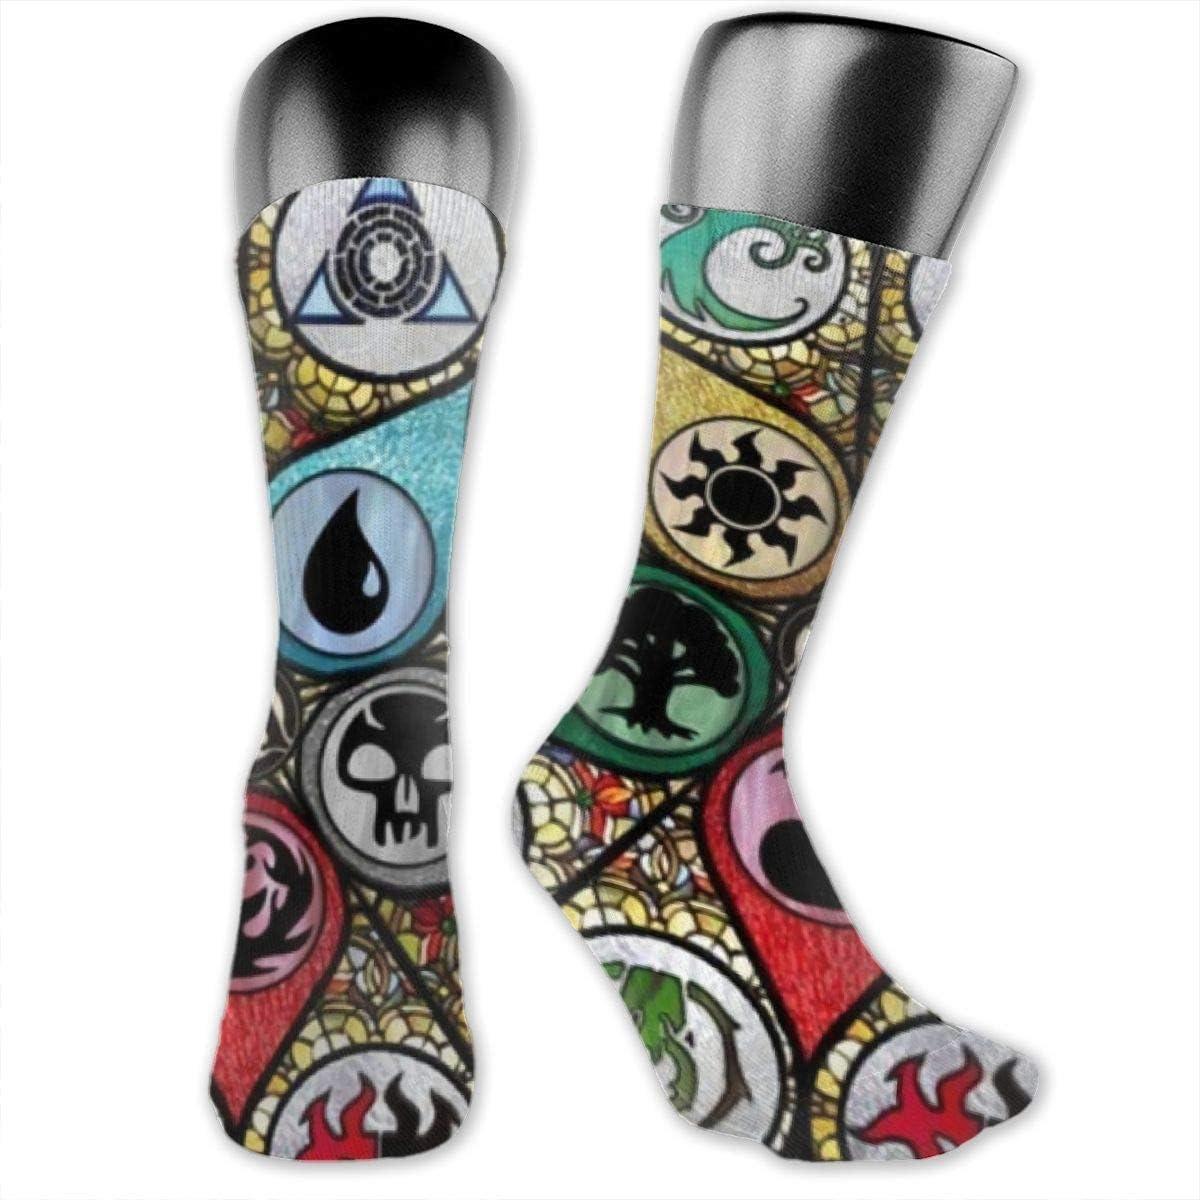 Magic The MTG Gathering Socks,High Ankle Socks Christmas Socks